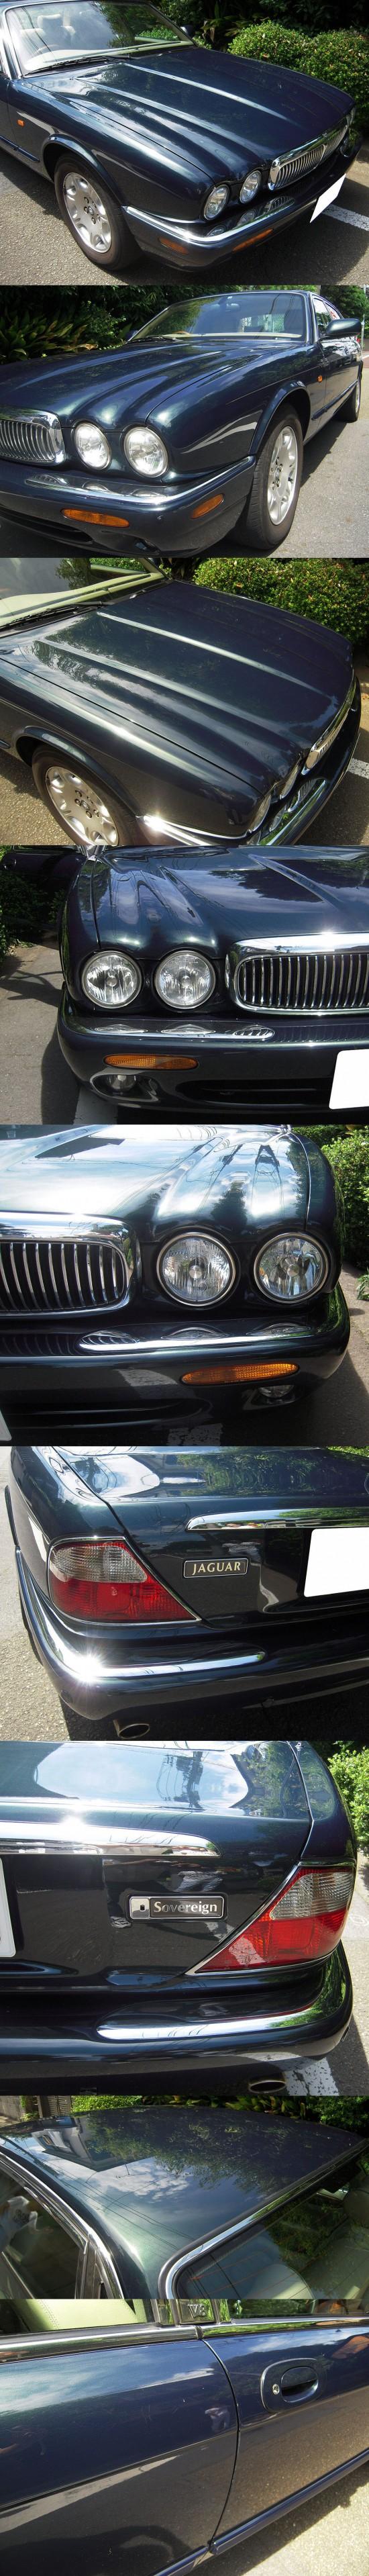 jaguar2-2